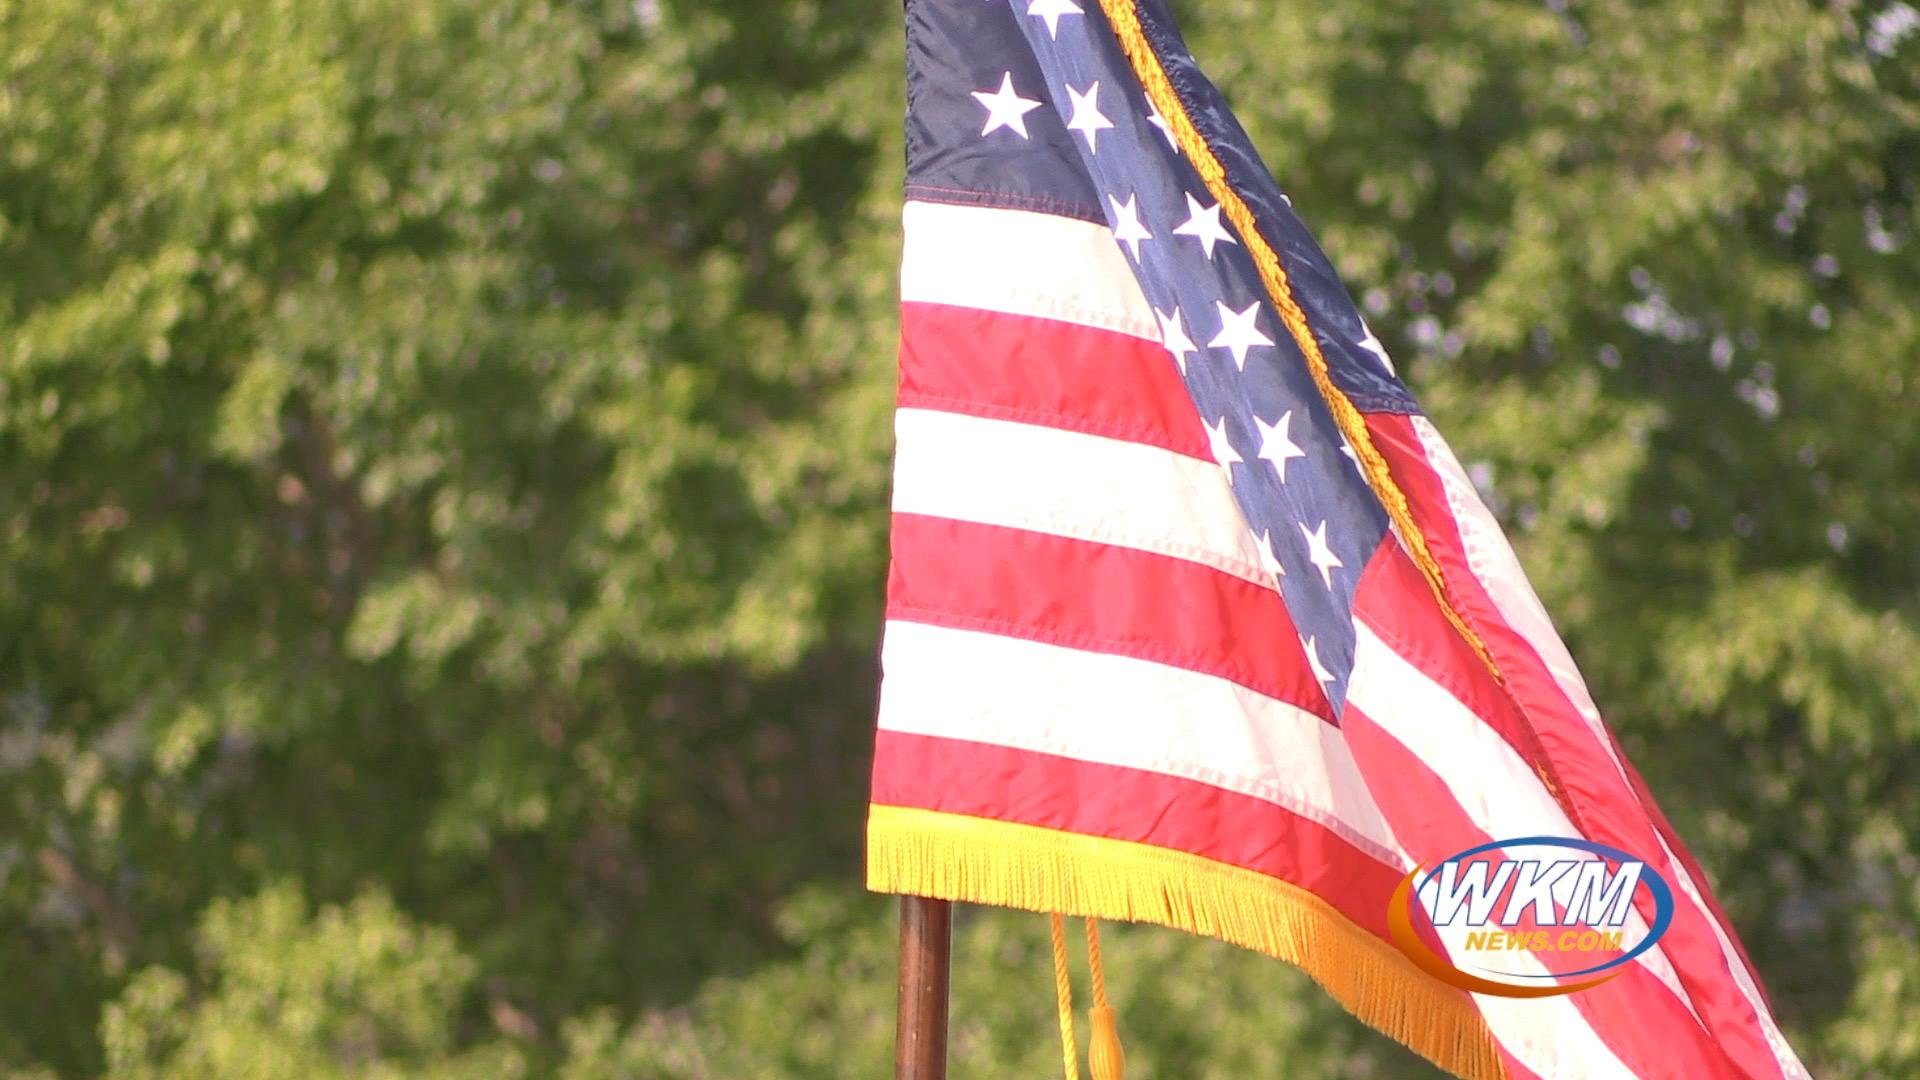 Jefferson County Holds Patriot Day Ceremony